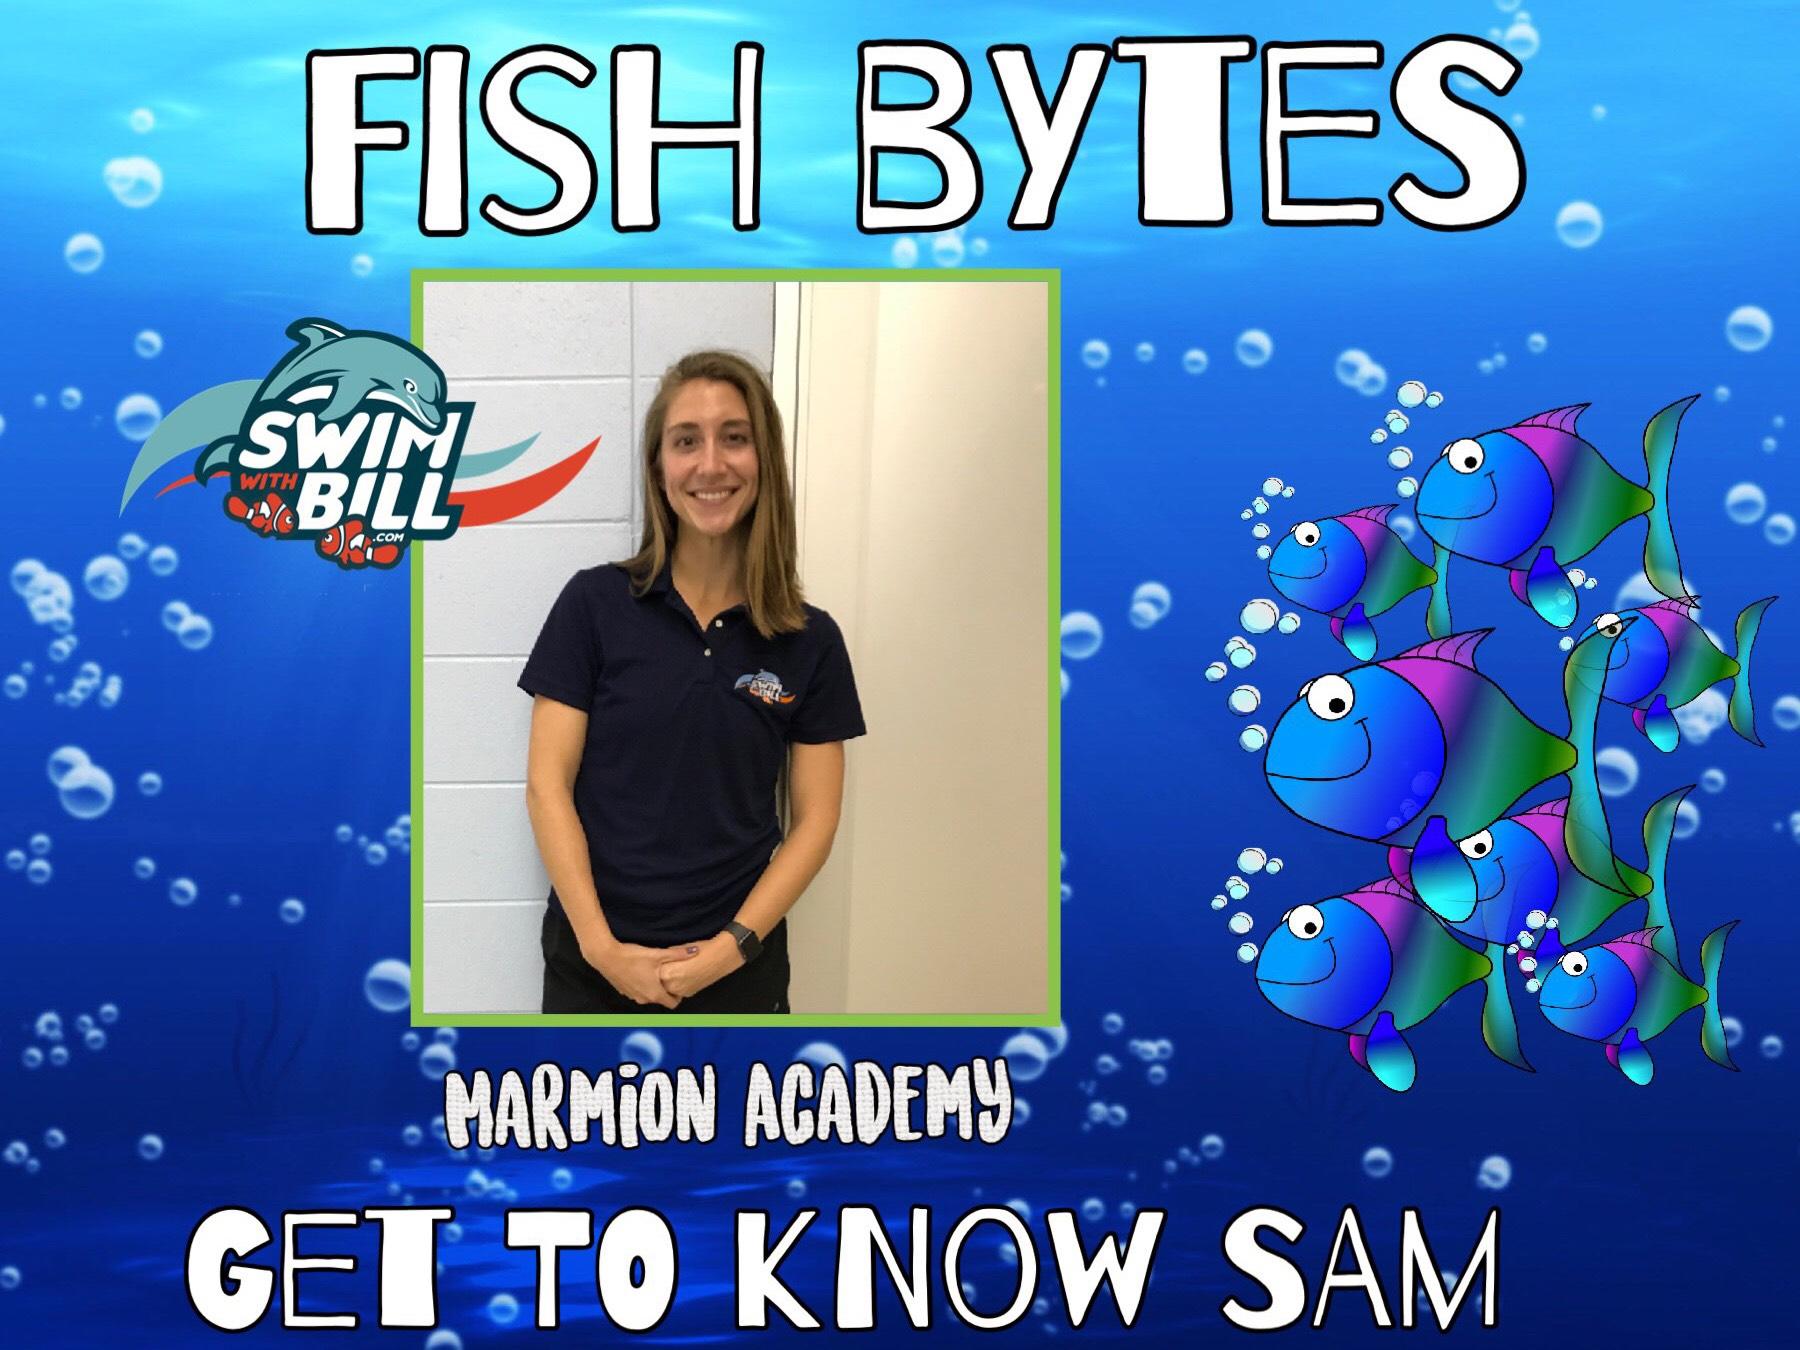 Get to know Sam!